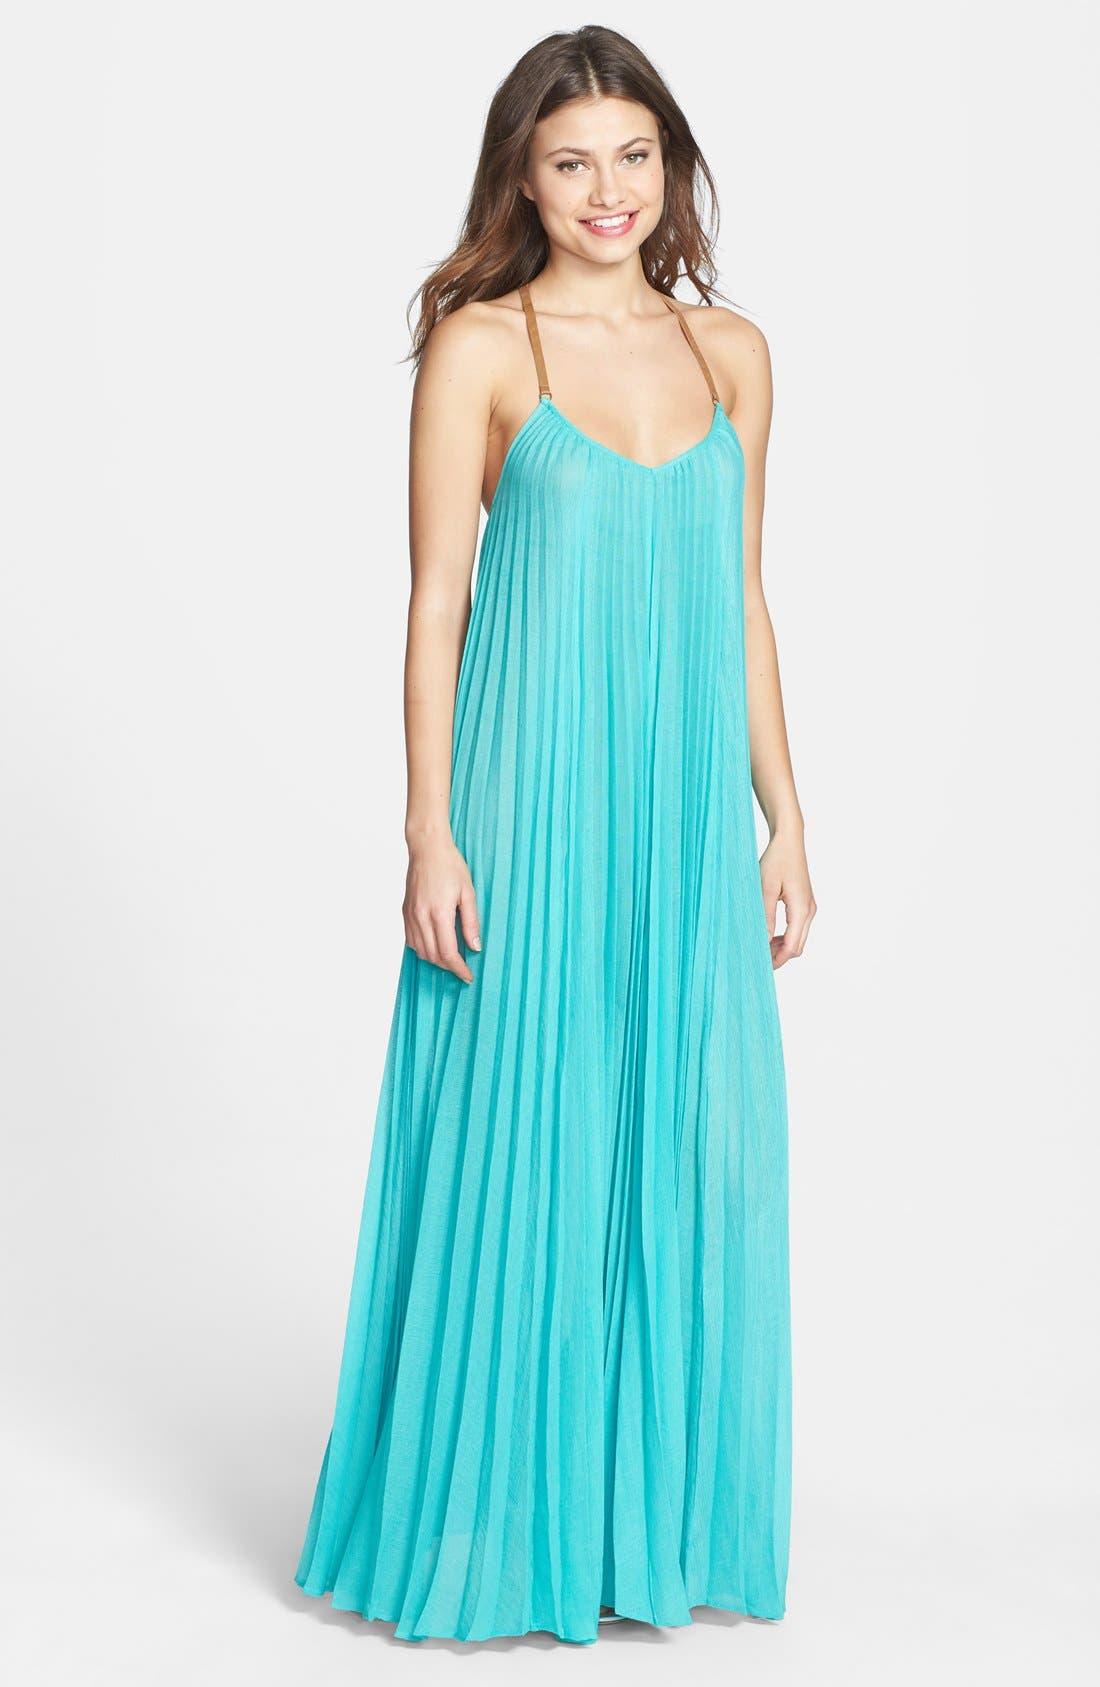 Main Image - BCBGMAXAZRIA 'Brynna' T-Strap Back Maxi Dress